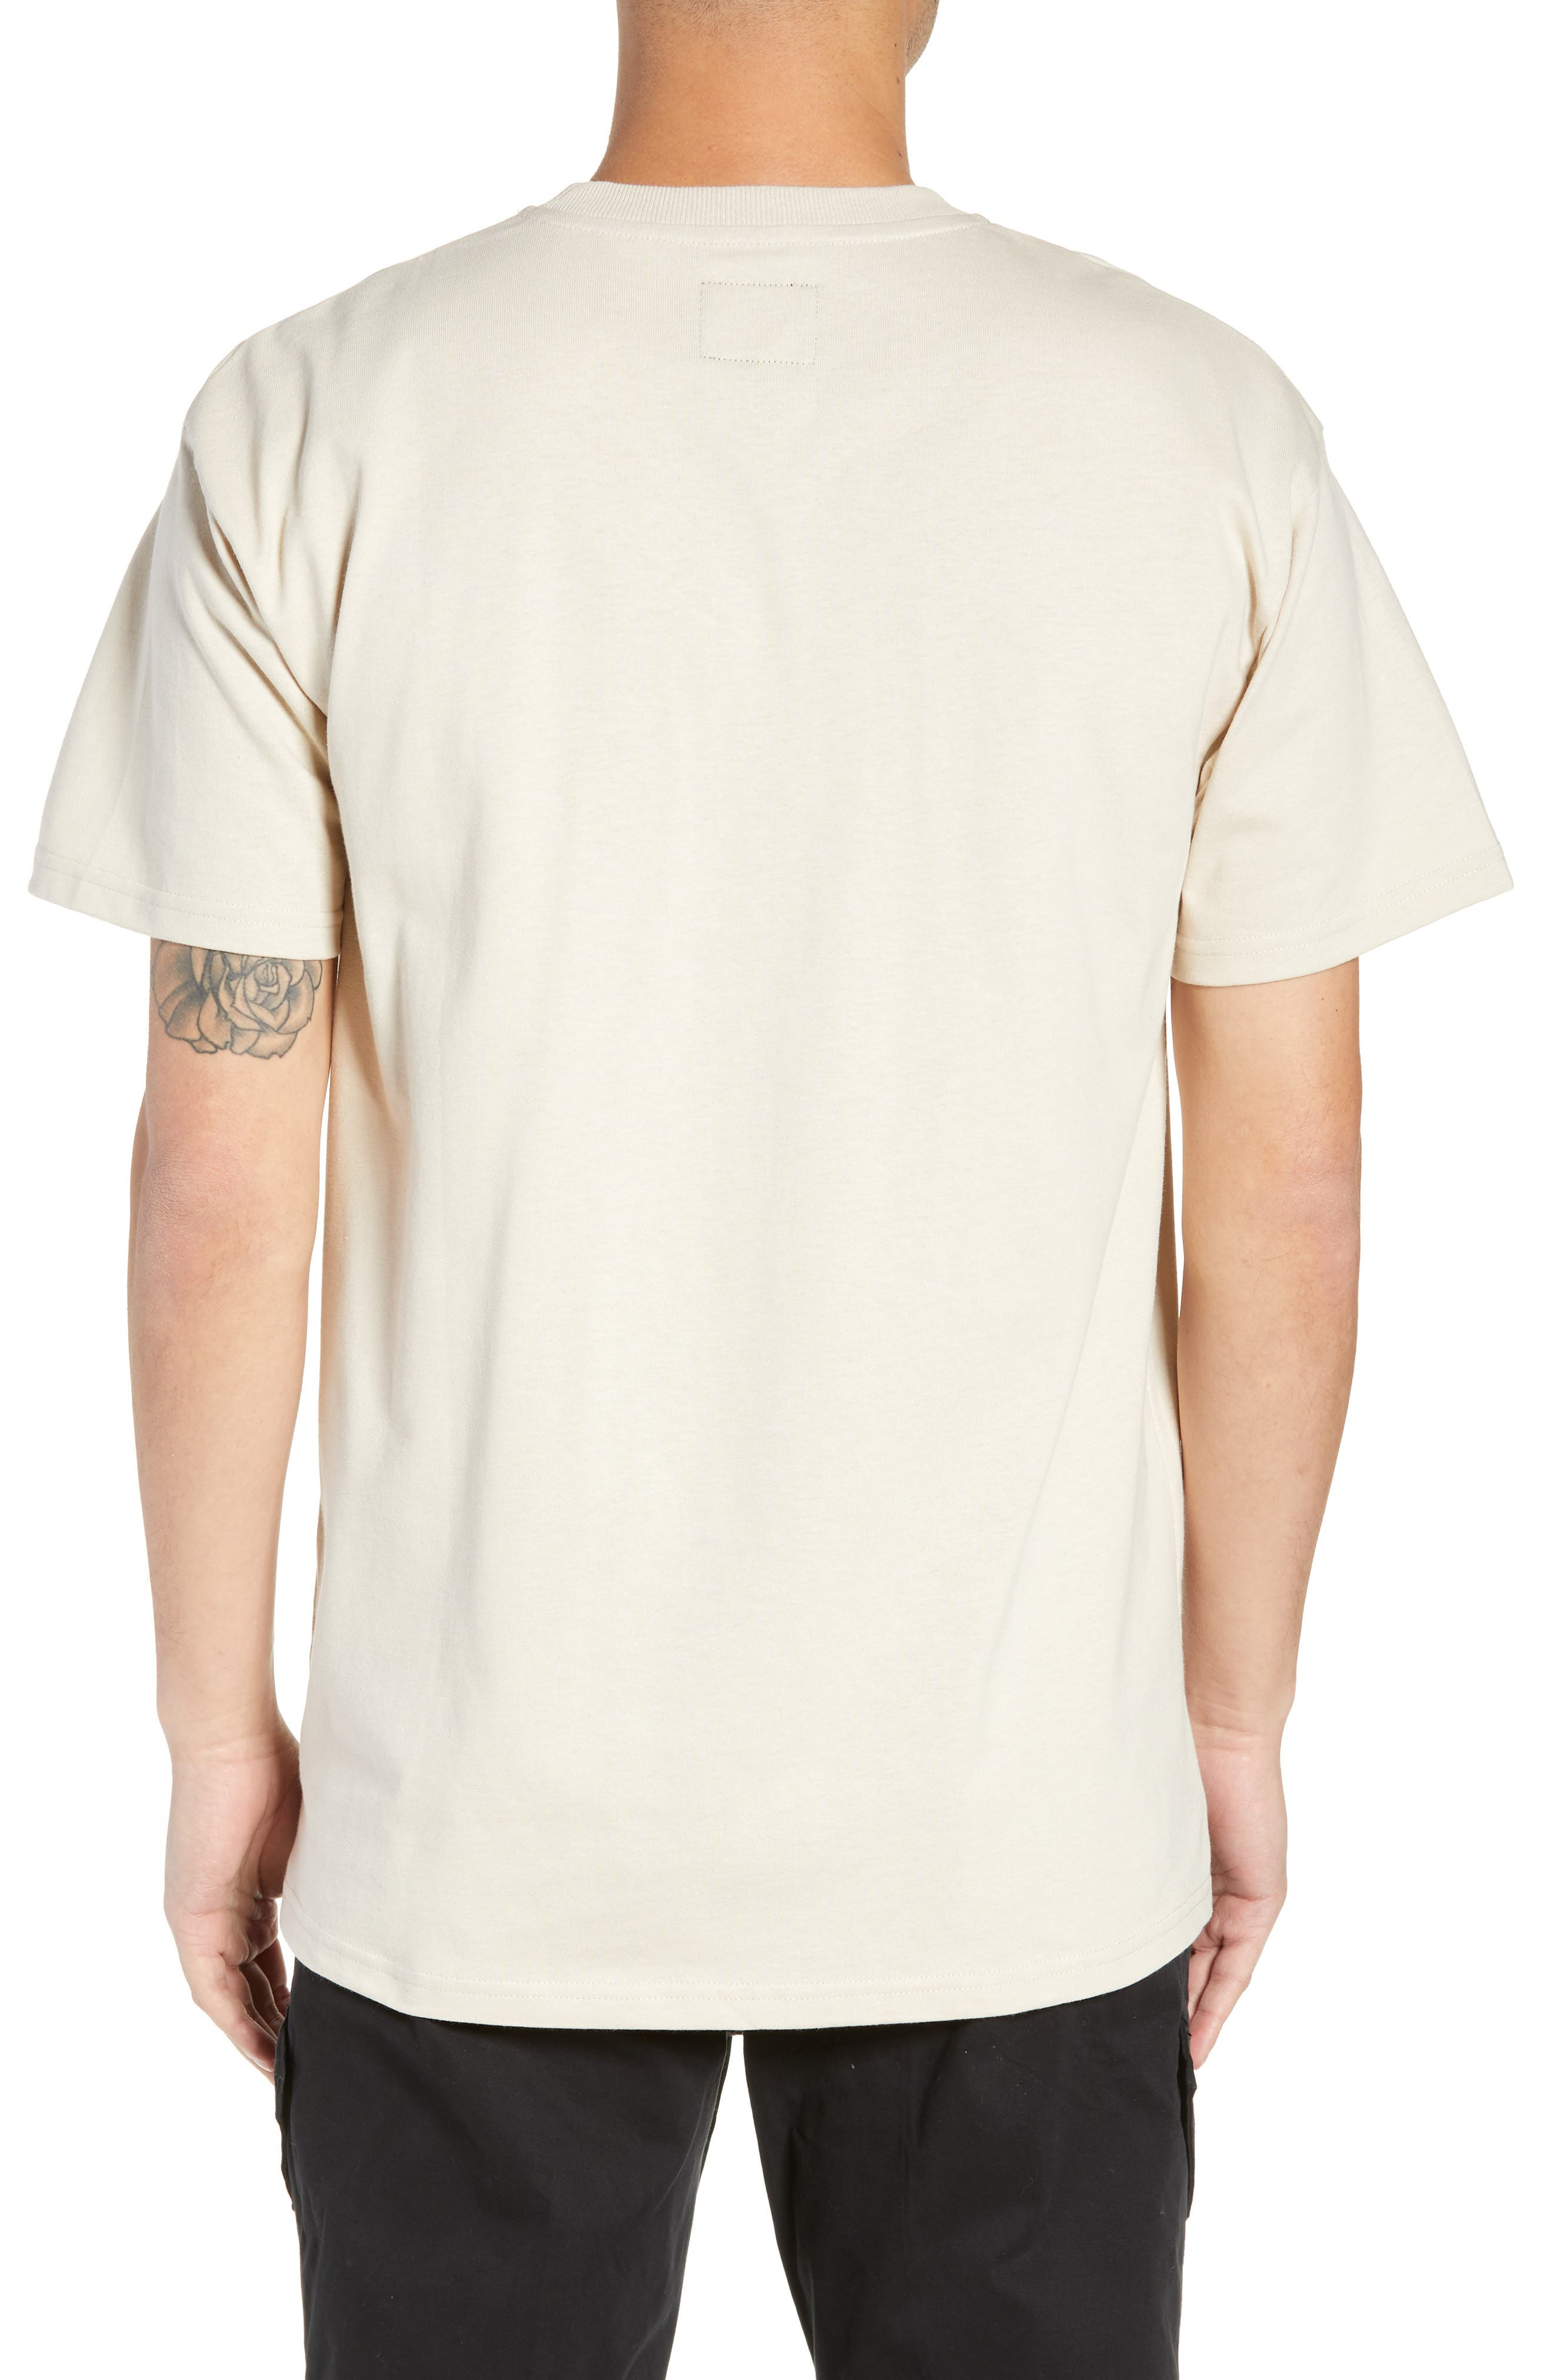 CARHARTT WORK IN PROGRESS,                             Survival Graphic T-Shirt,                             Alternate thumbnail 2, color,                             250